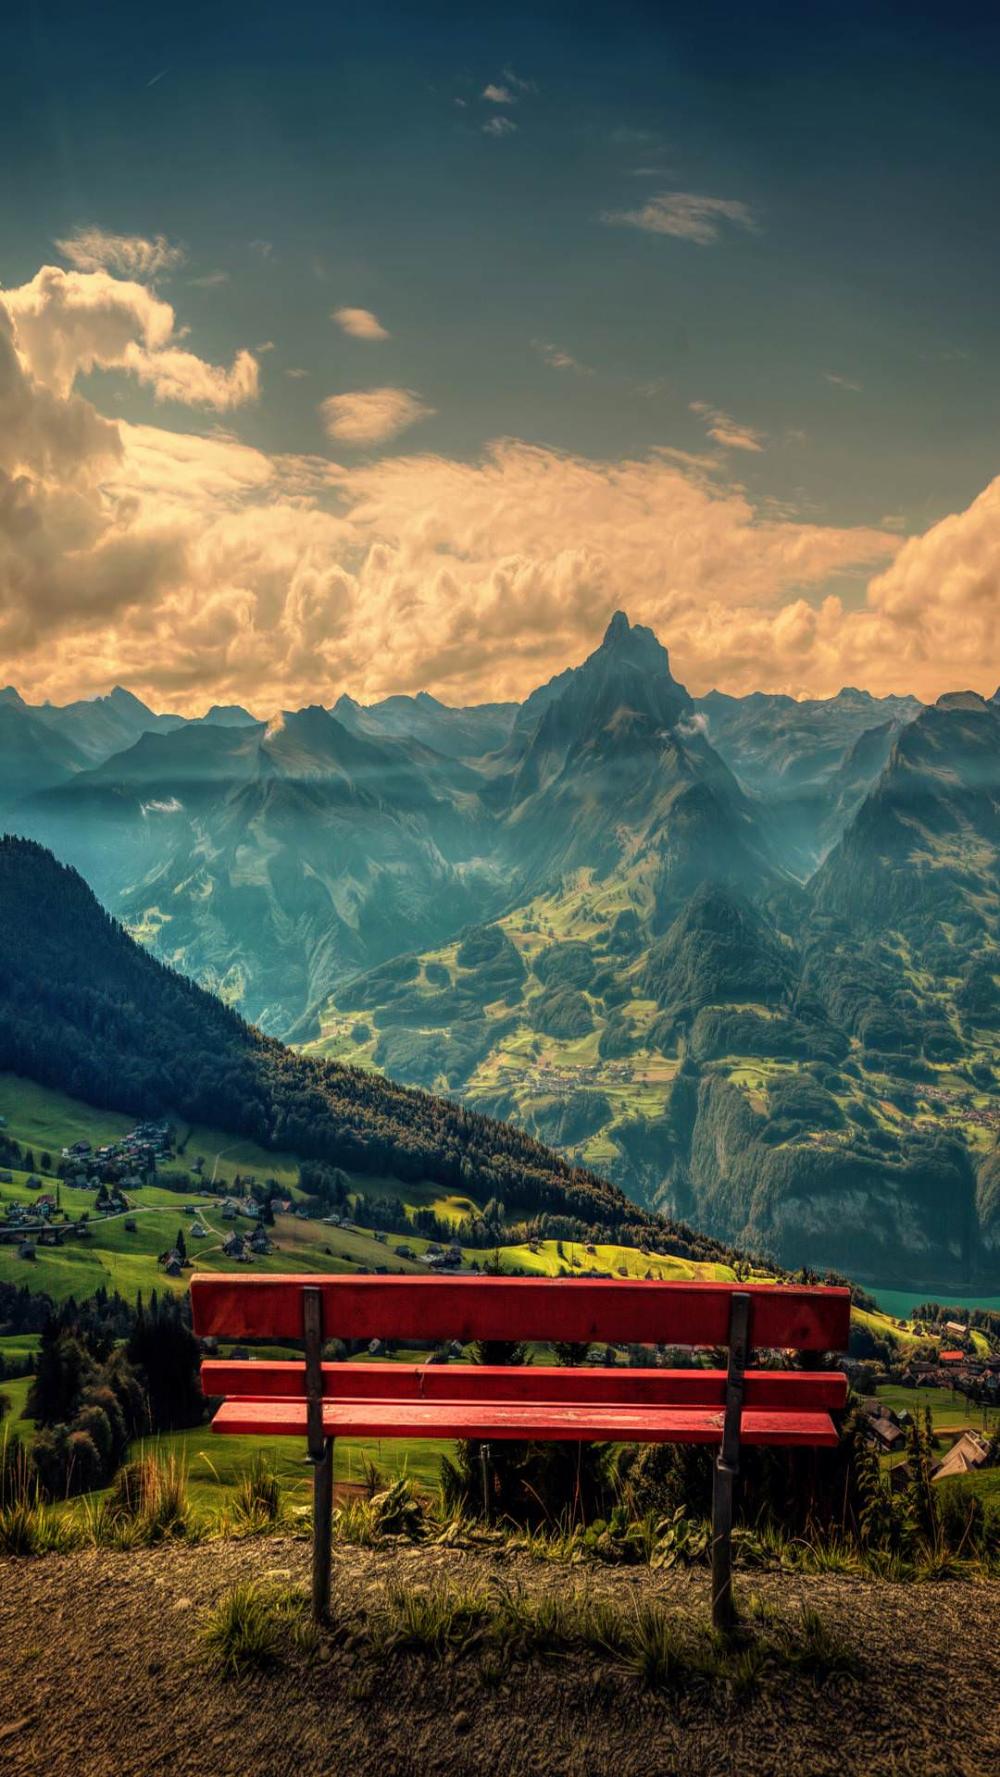 Wallpaper Dump 1080x1920 Beautiful Landscape Wallpaper Scenic Wallpaper Landscape Wallpaper